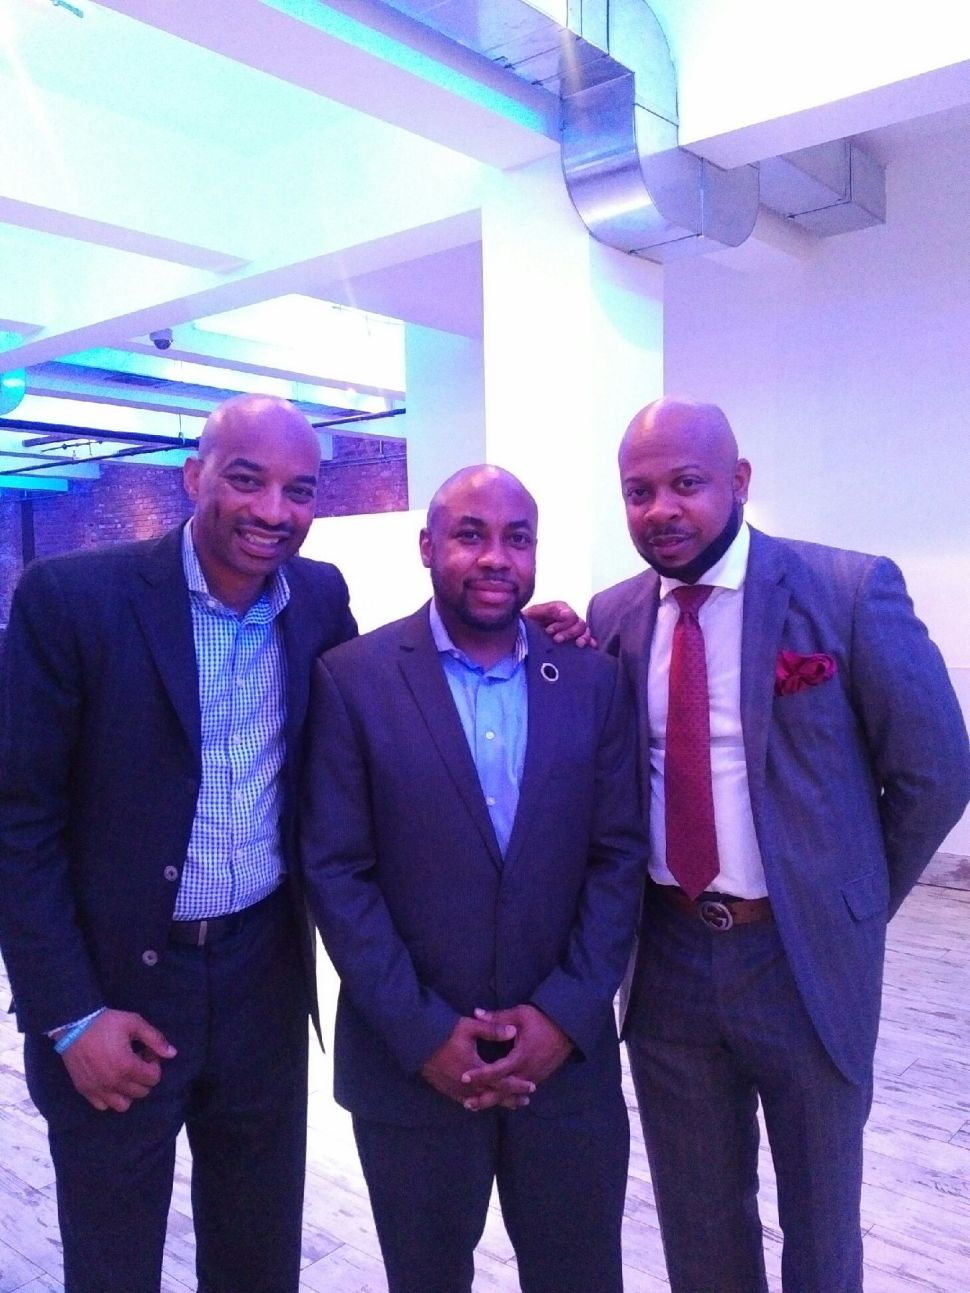 Fromleft: Butler, Balmir and COS Baraka.